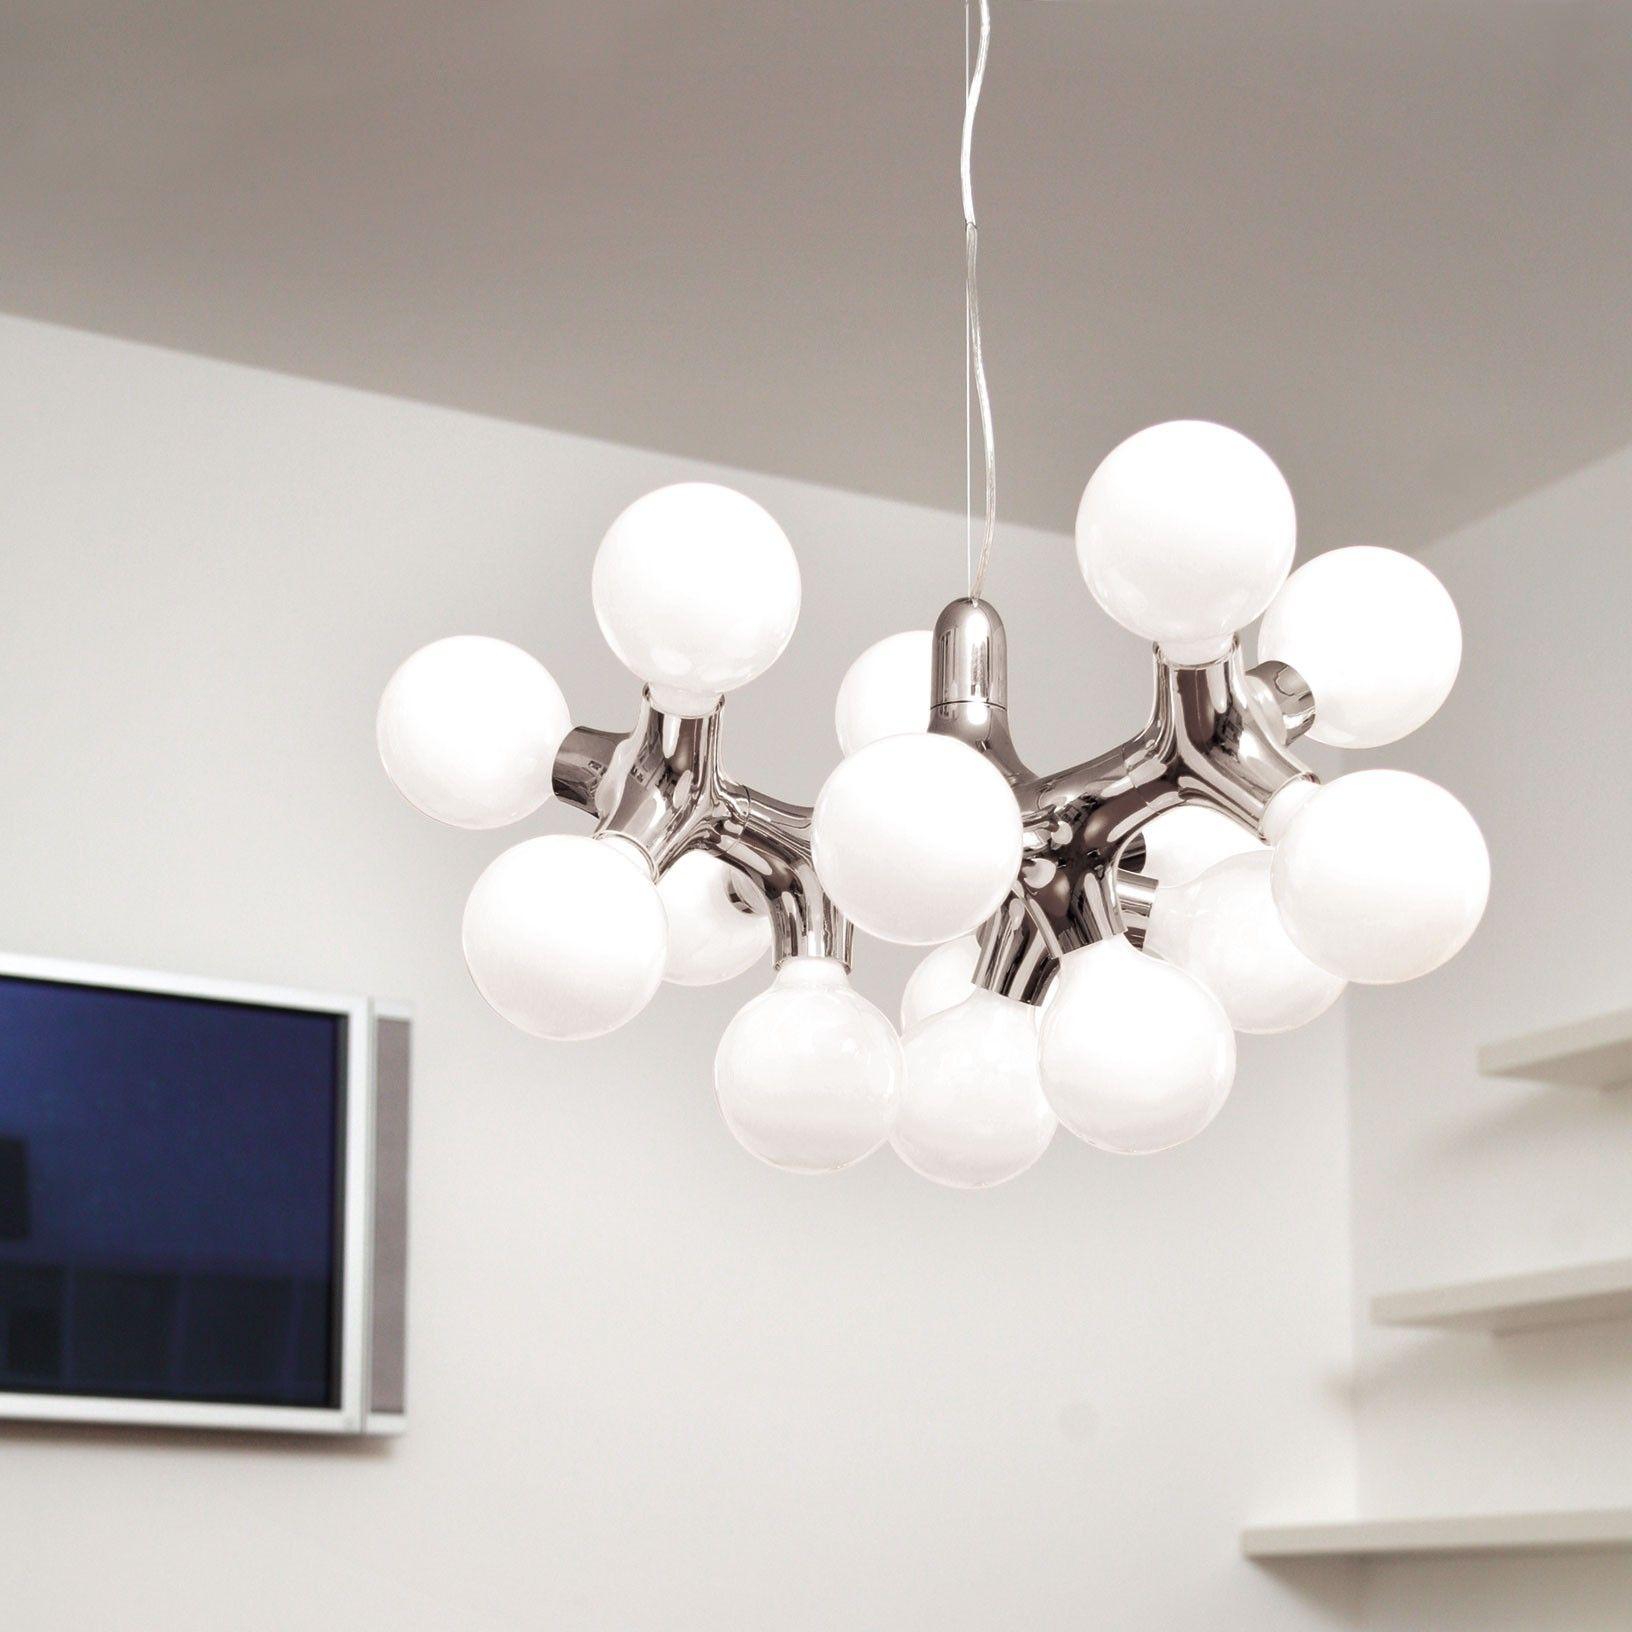 Next DNA Kronleuchter - Lampe & Leuchte | Lights | Pinterest ...